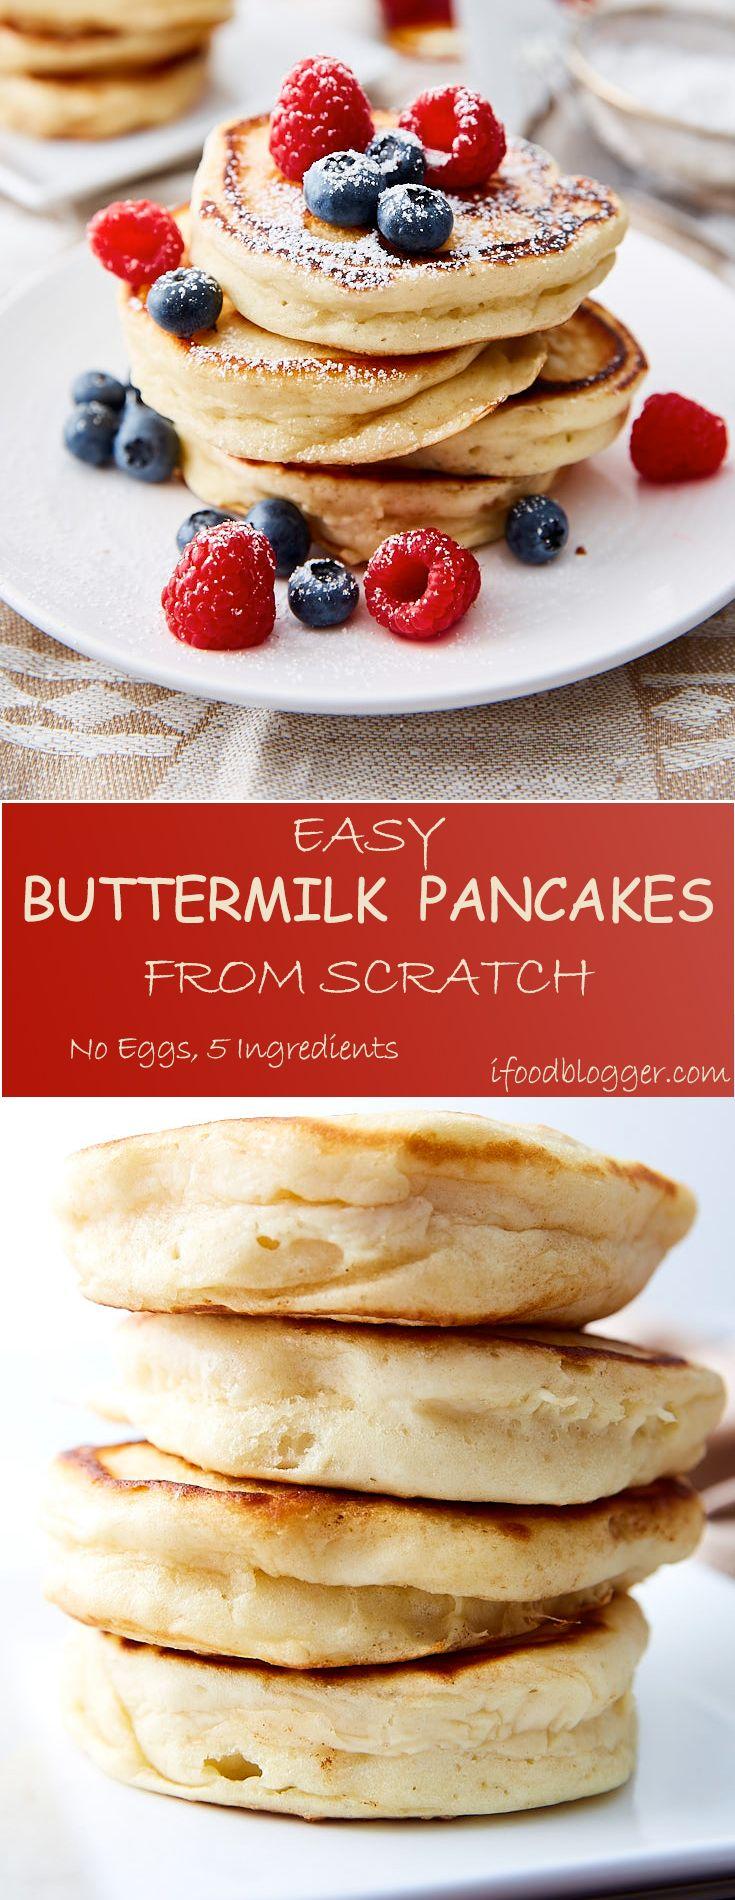 how to make pancakes without baking powder or soda